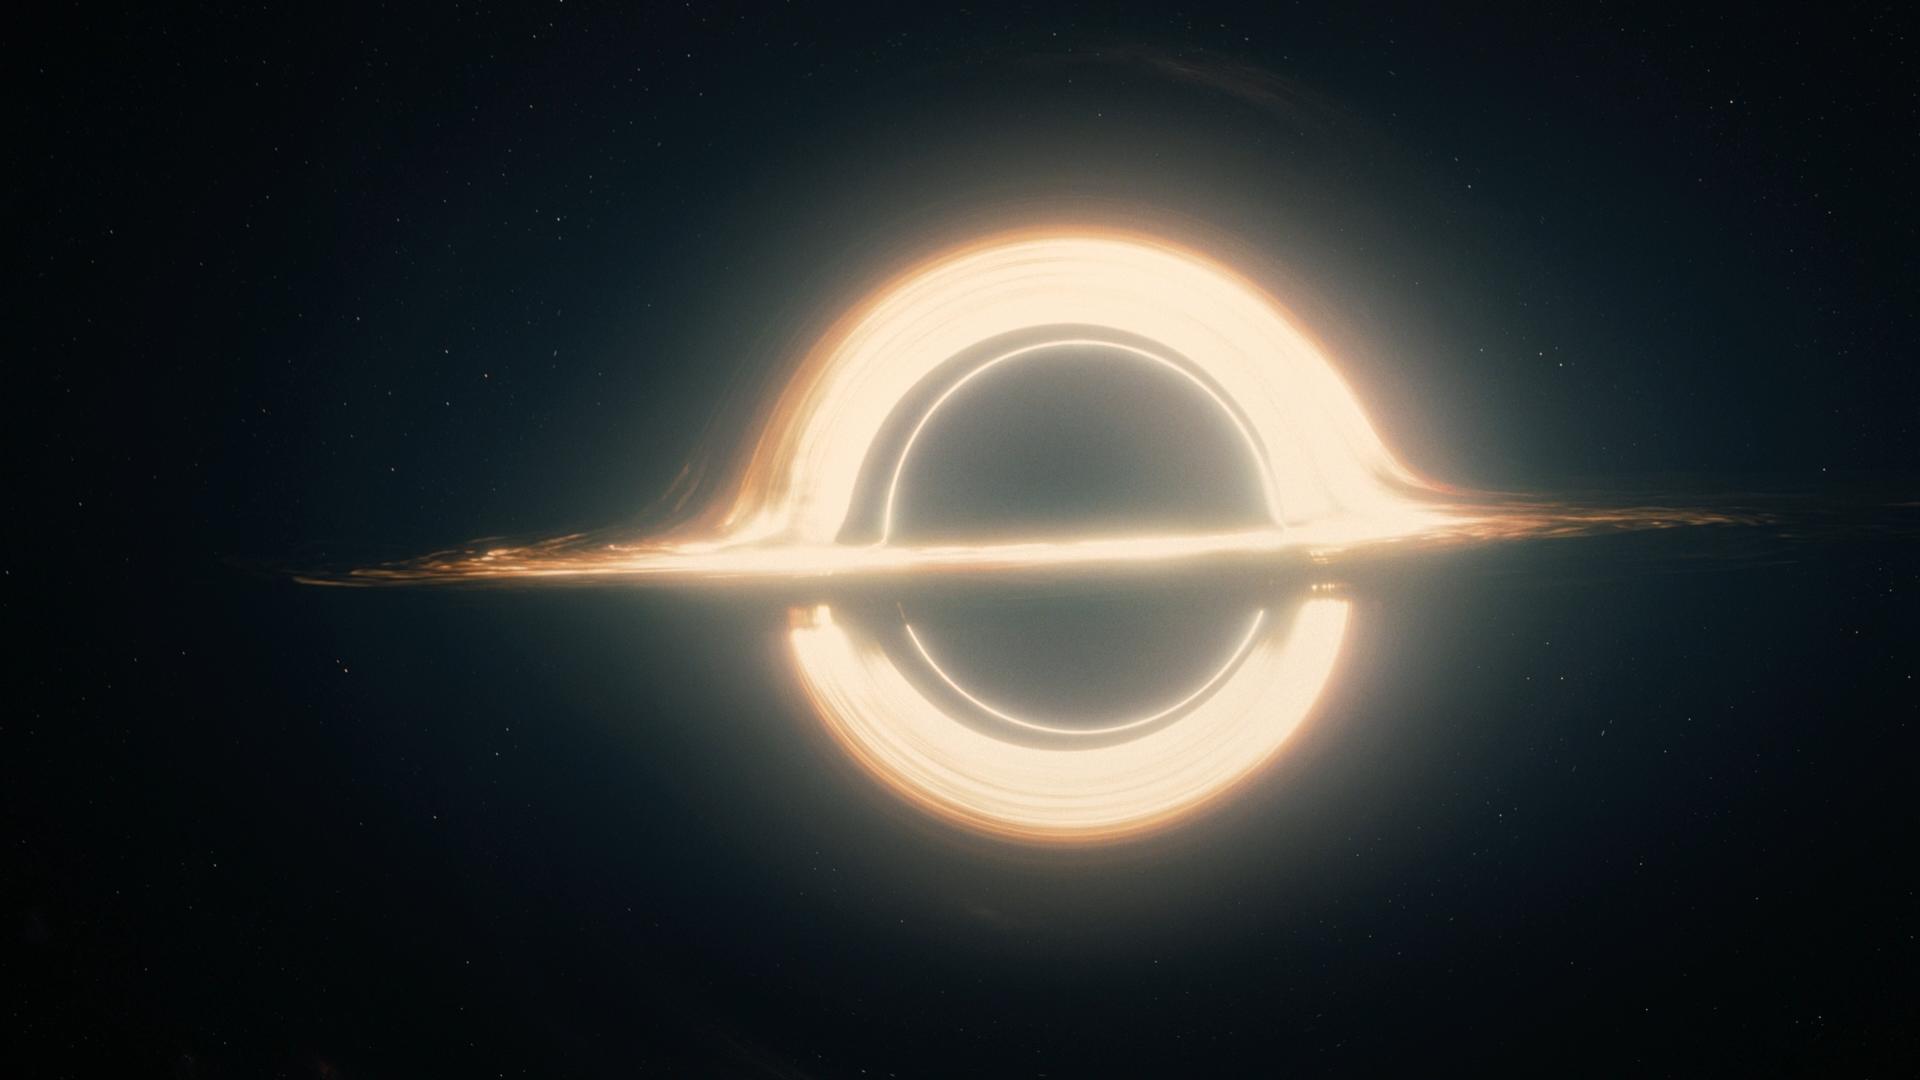 Qcs7bva Png 1920 1080 Interstellar Black Hole Black Hole Wallpaper